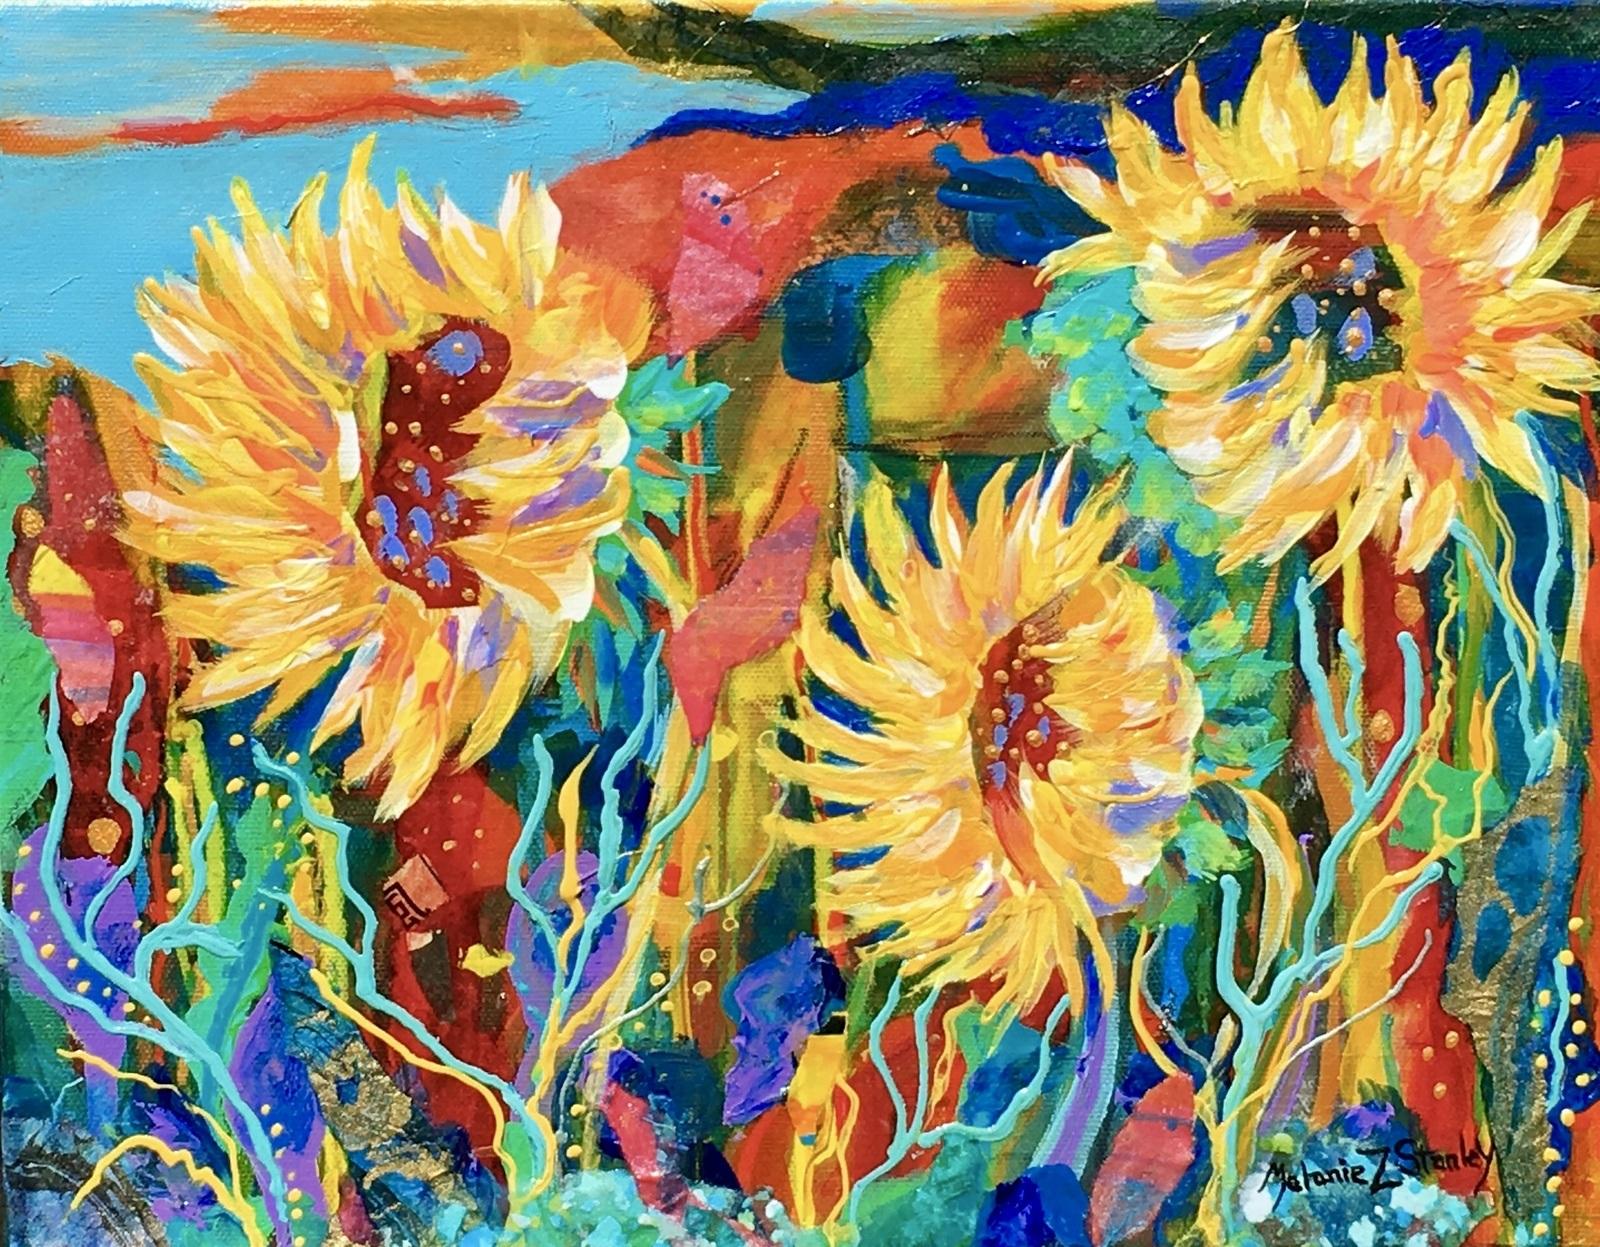 Melanie Stanley, Sunflowers